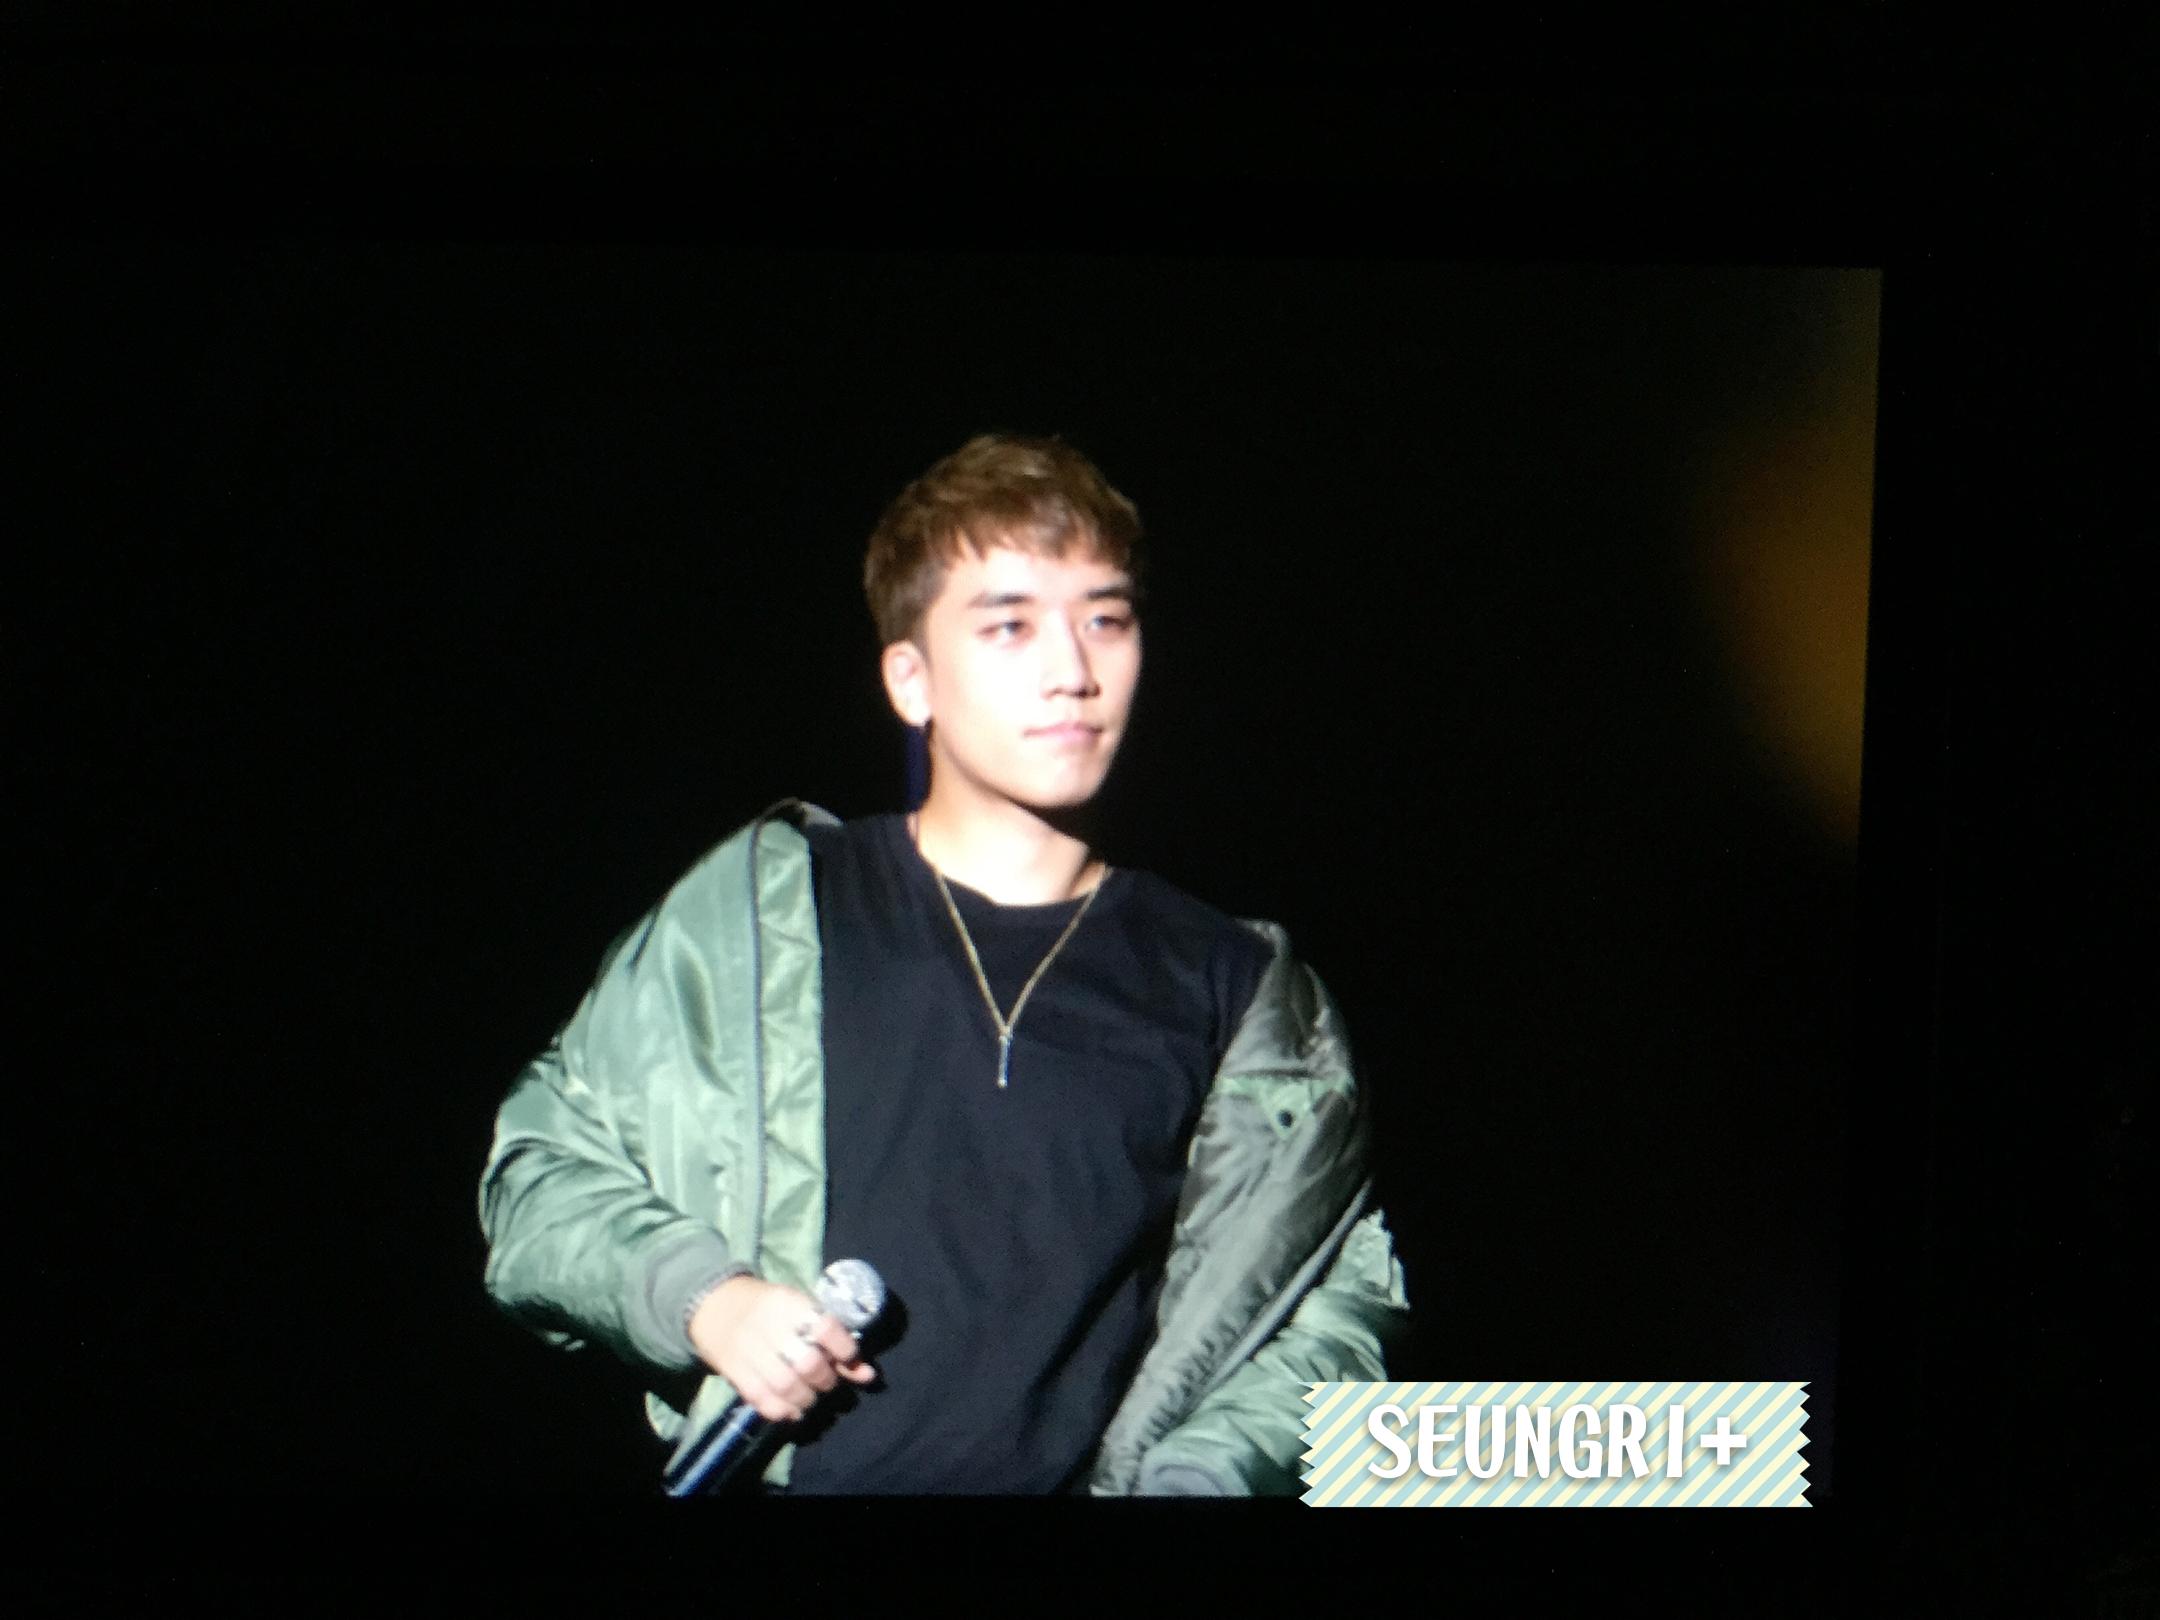 BIGBANG - Made Tour 2015 - Hangzhou - 25aug2015 - seungrifamily - 11.jpg